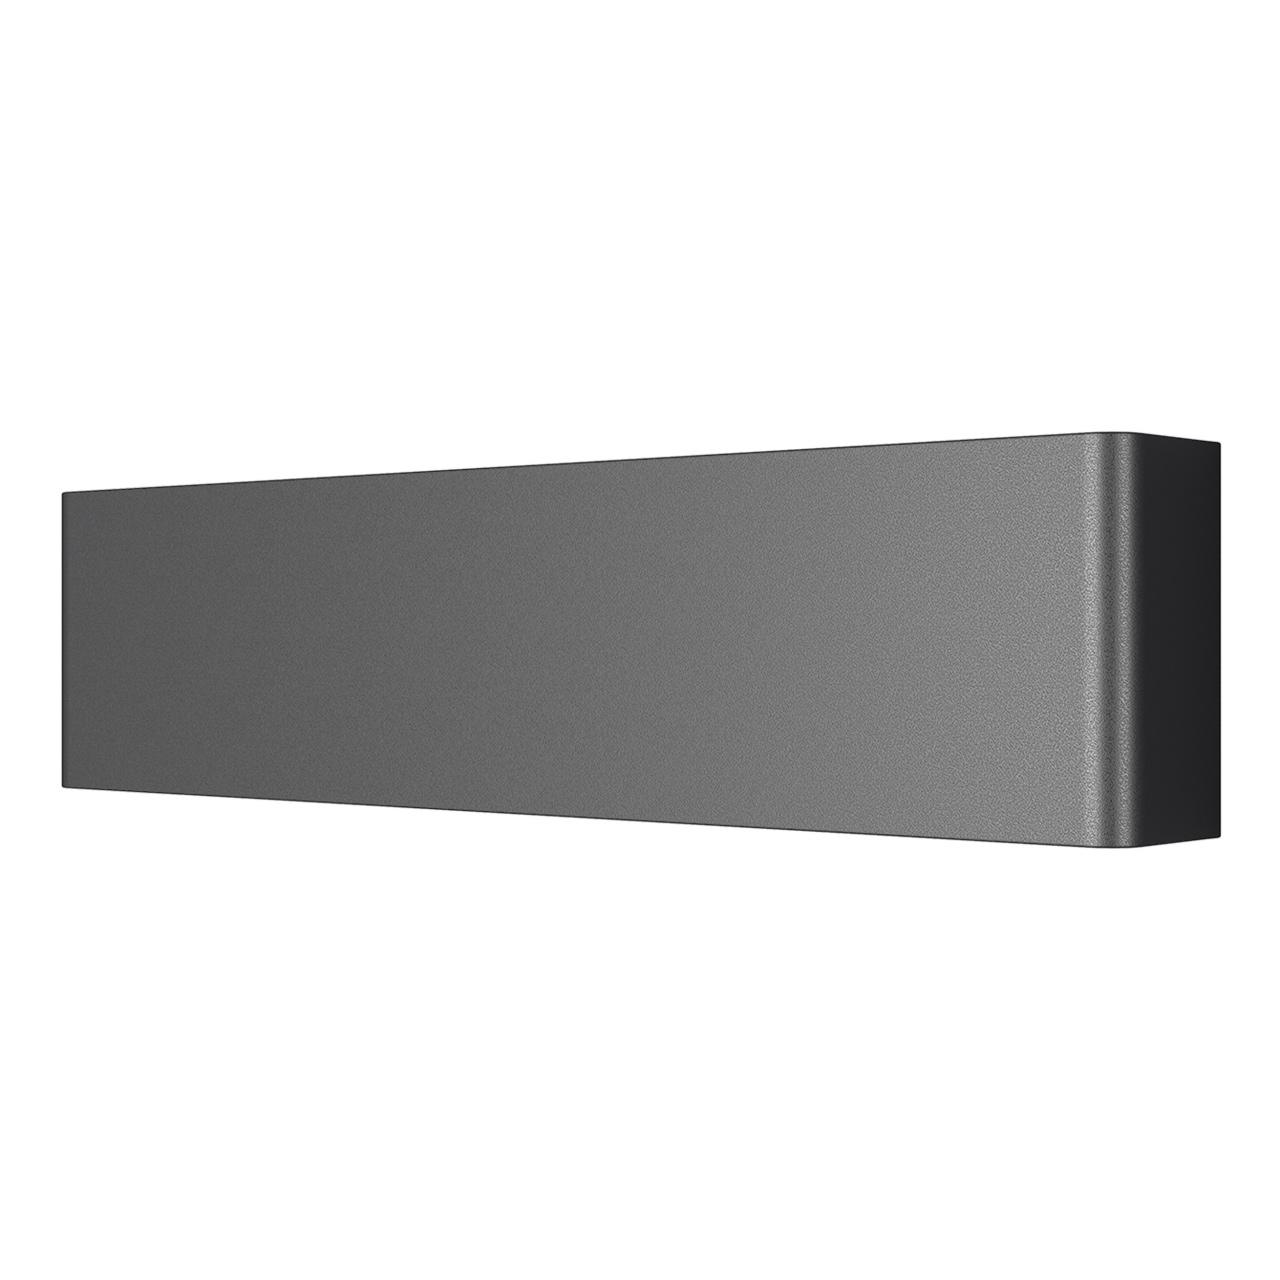 Бра Fiume 10W 950LM матовый черный 4000K Lightstar 810617